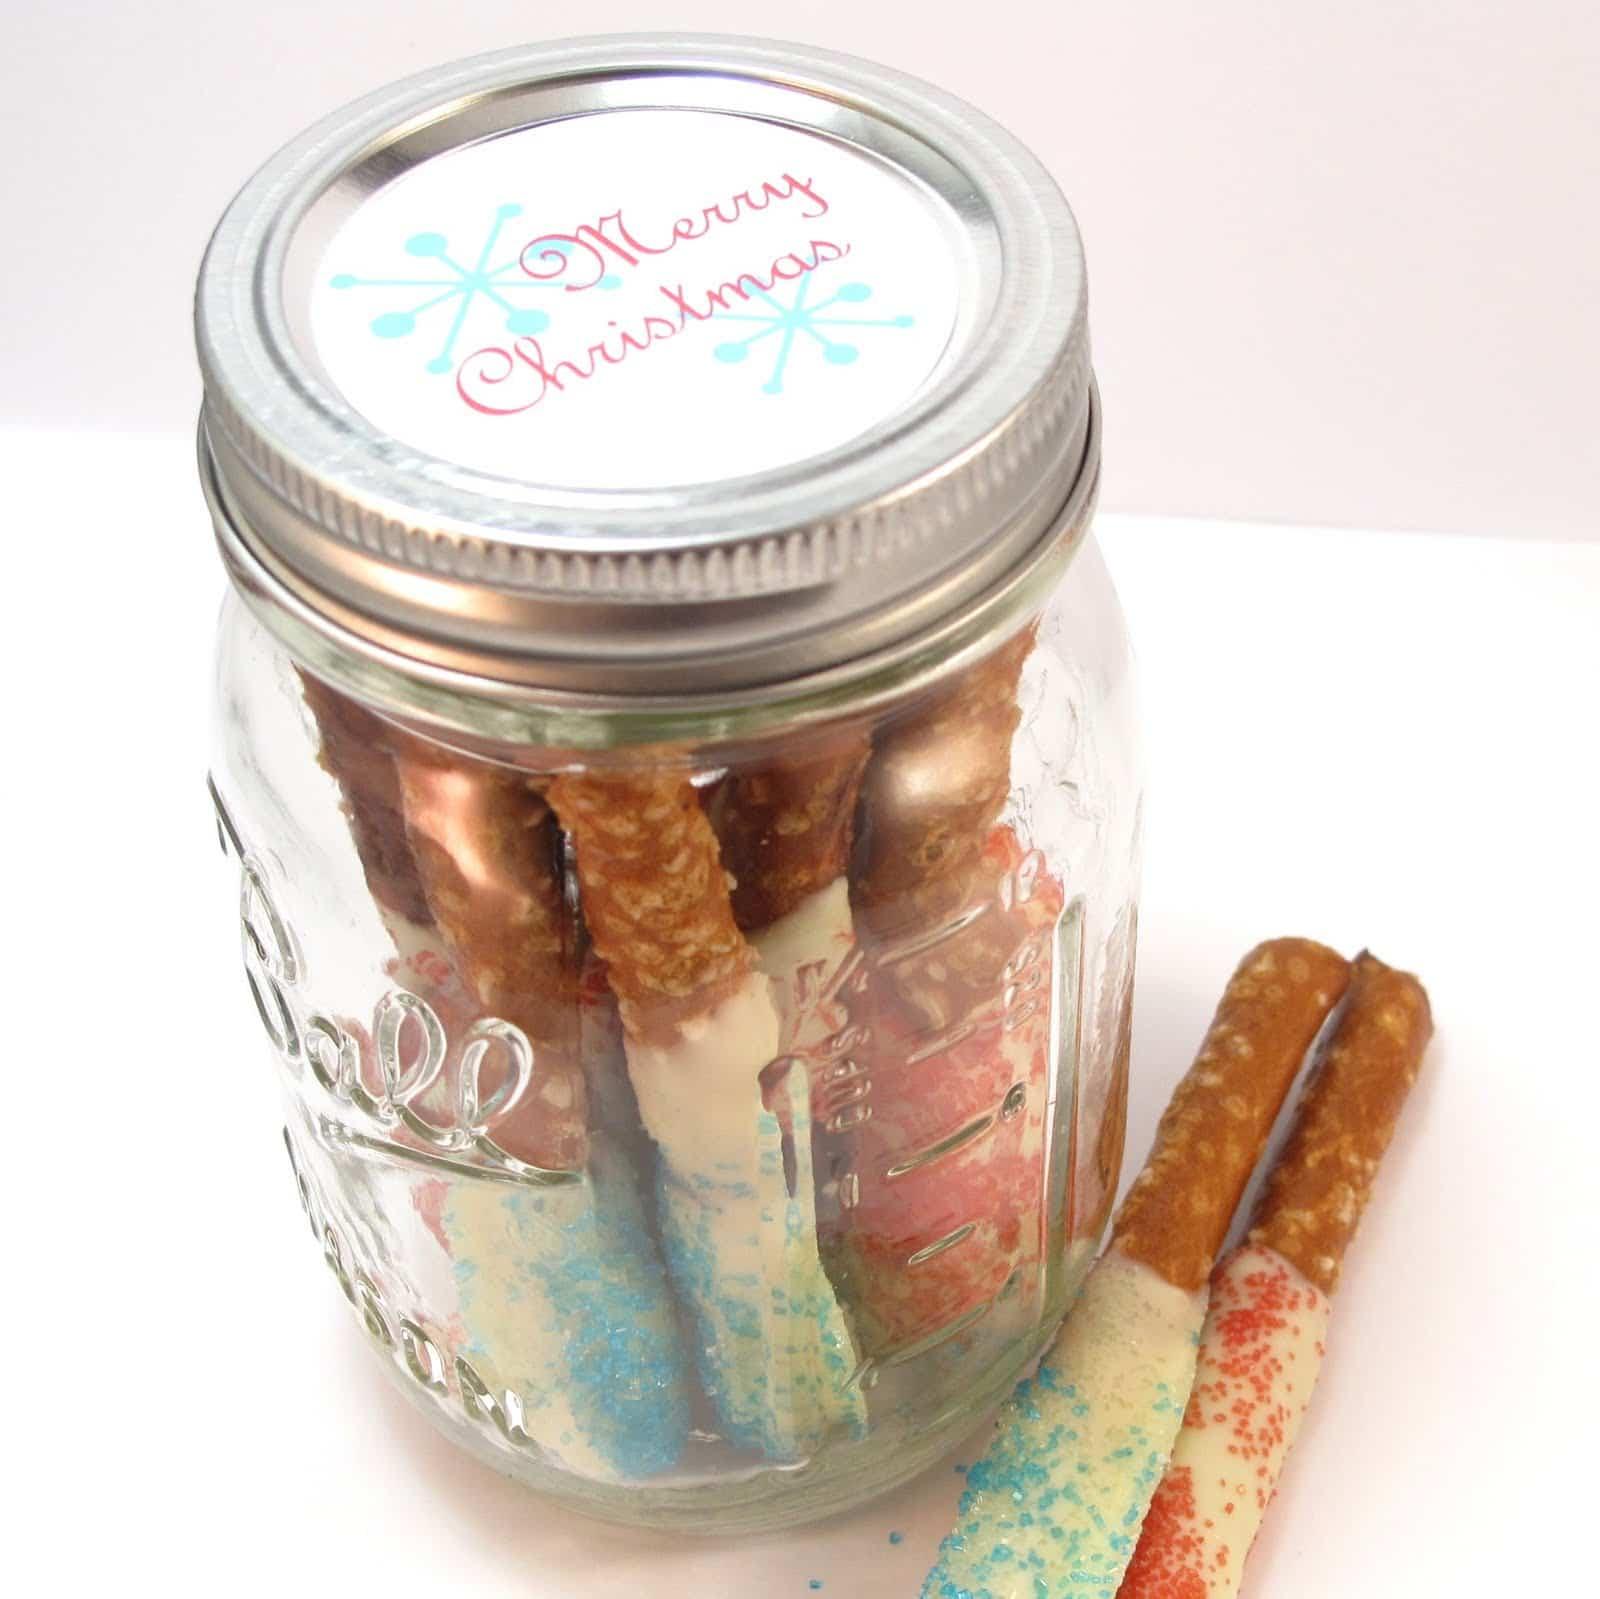 hot cocoa gift: Marshmallow snowman hot cocoa jars ...